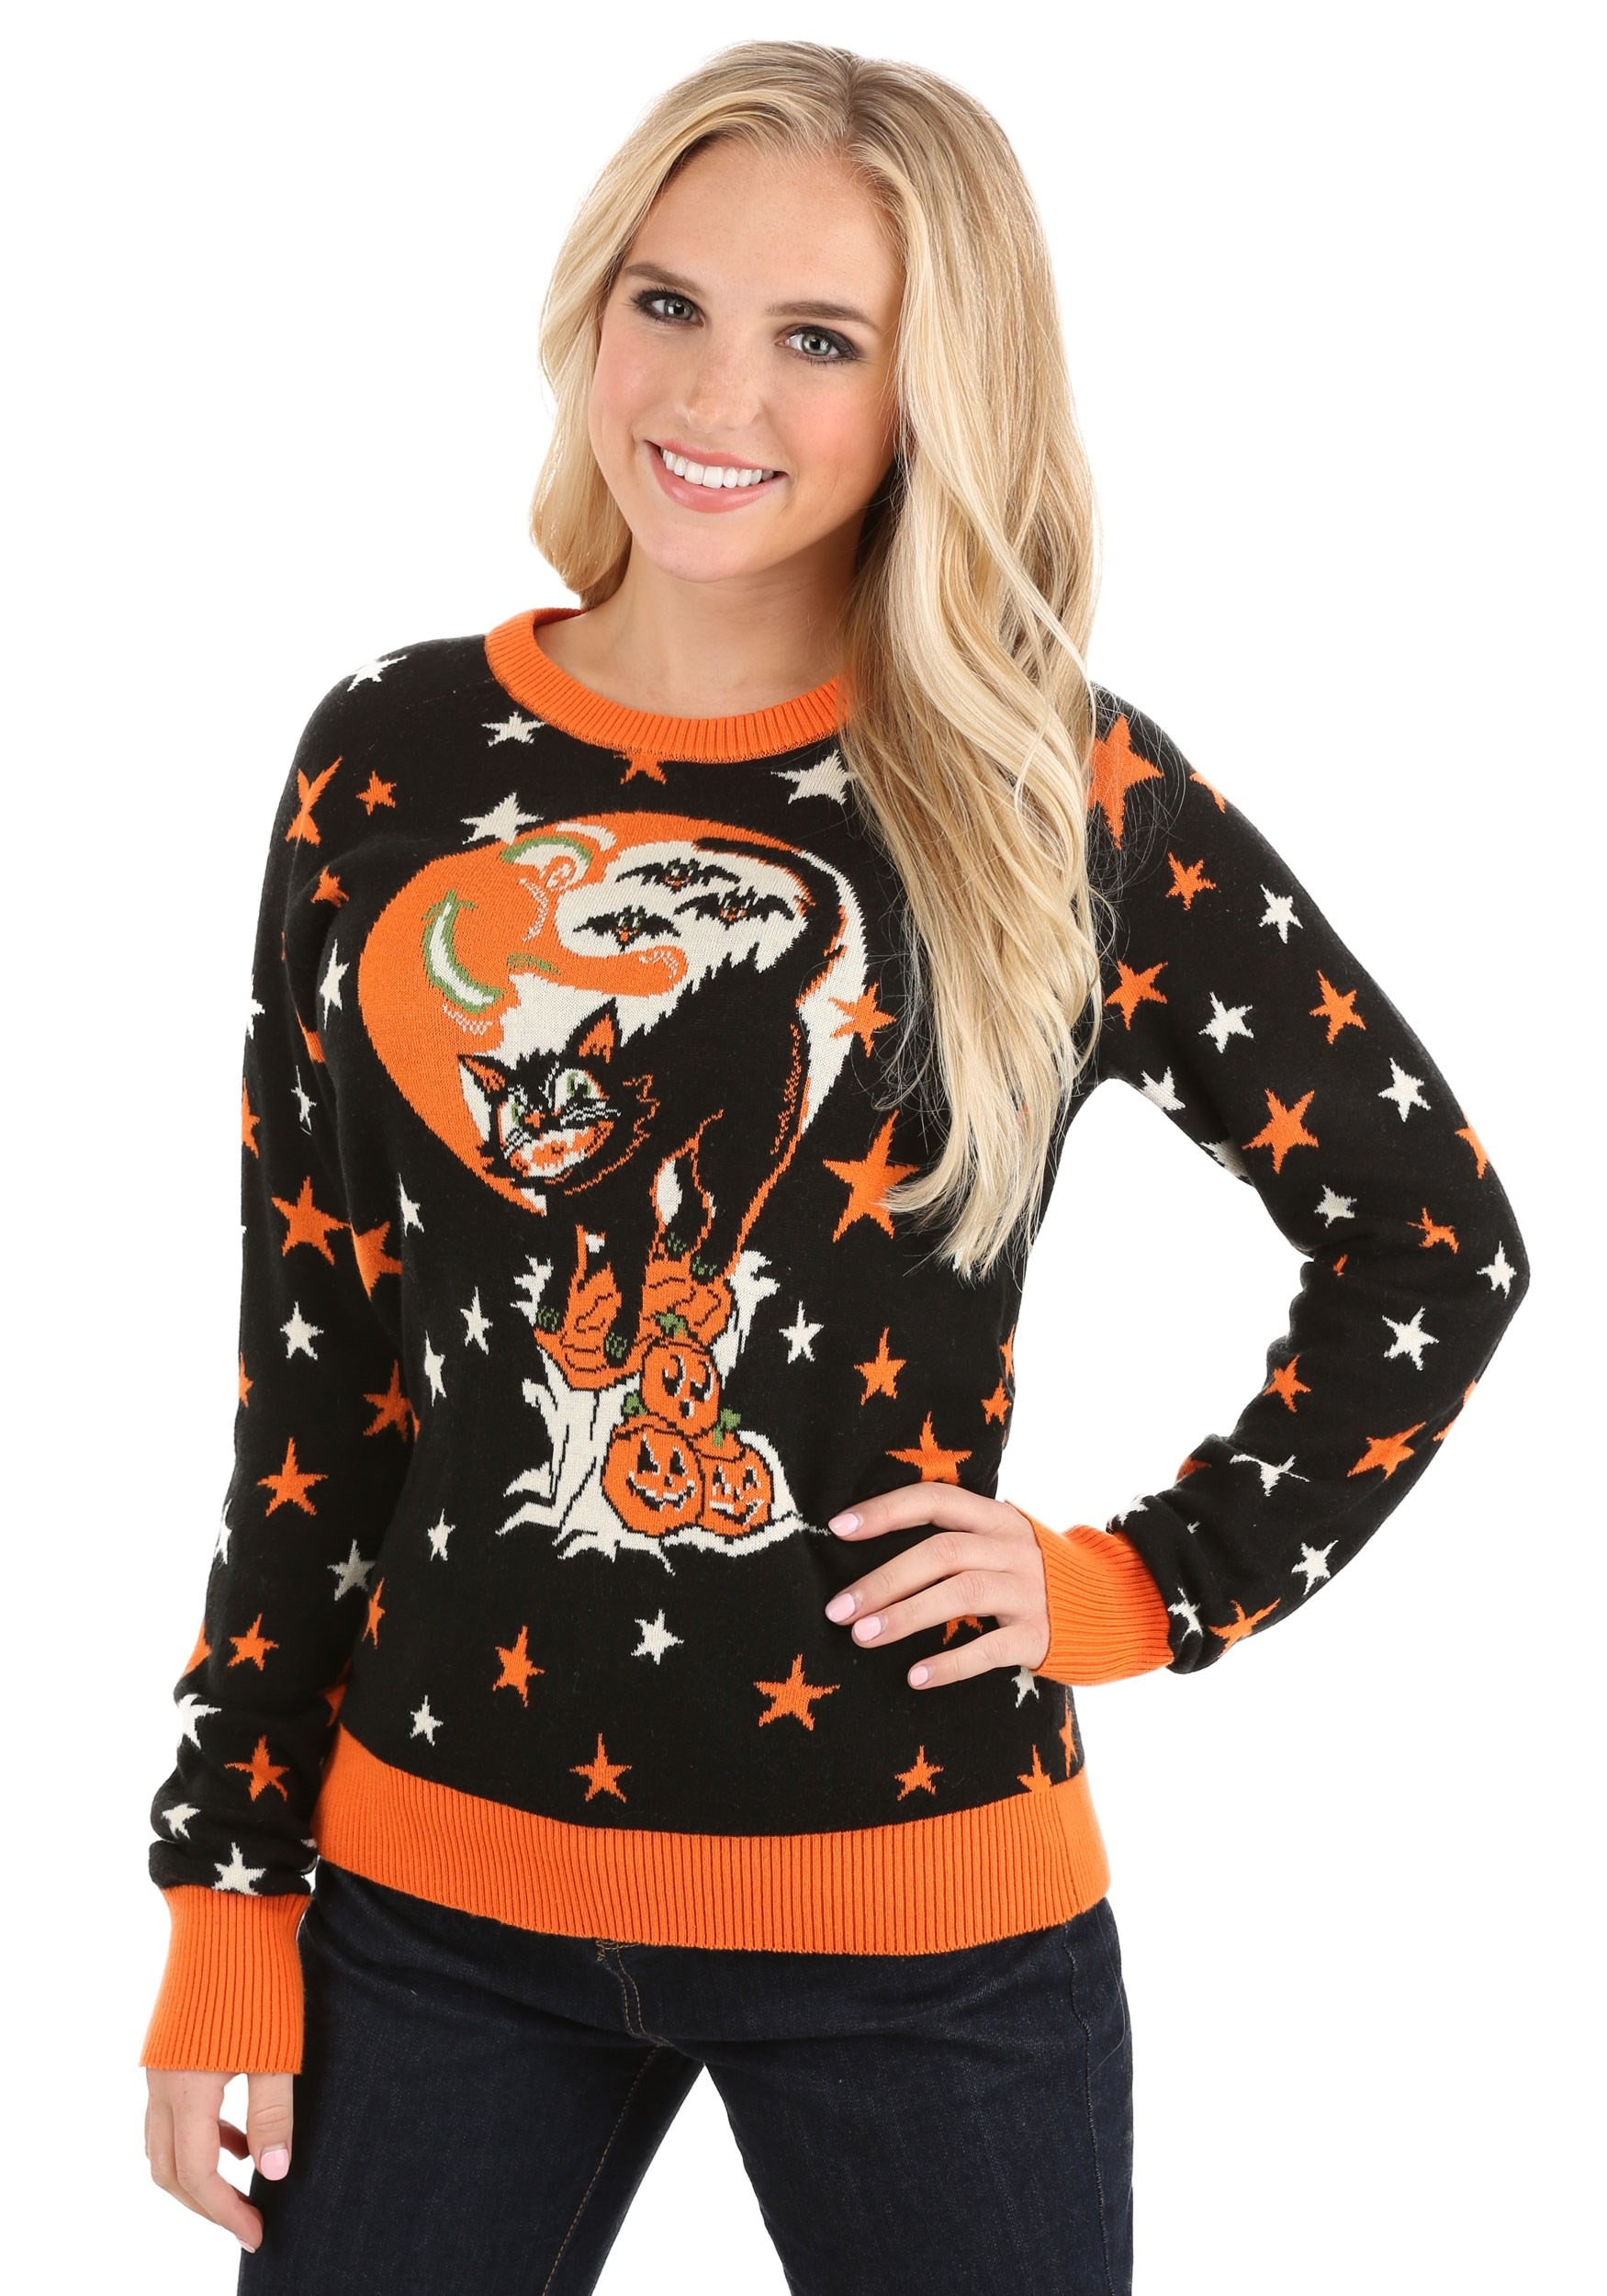 Vintage Halloween Cat Halloween Sweater   Spooky Sweater